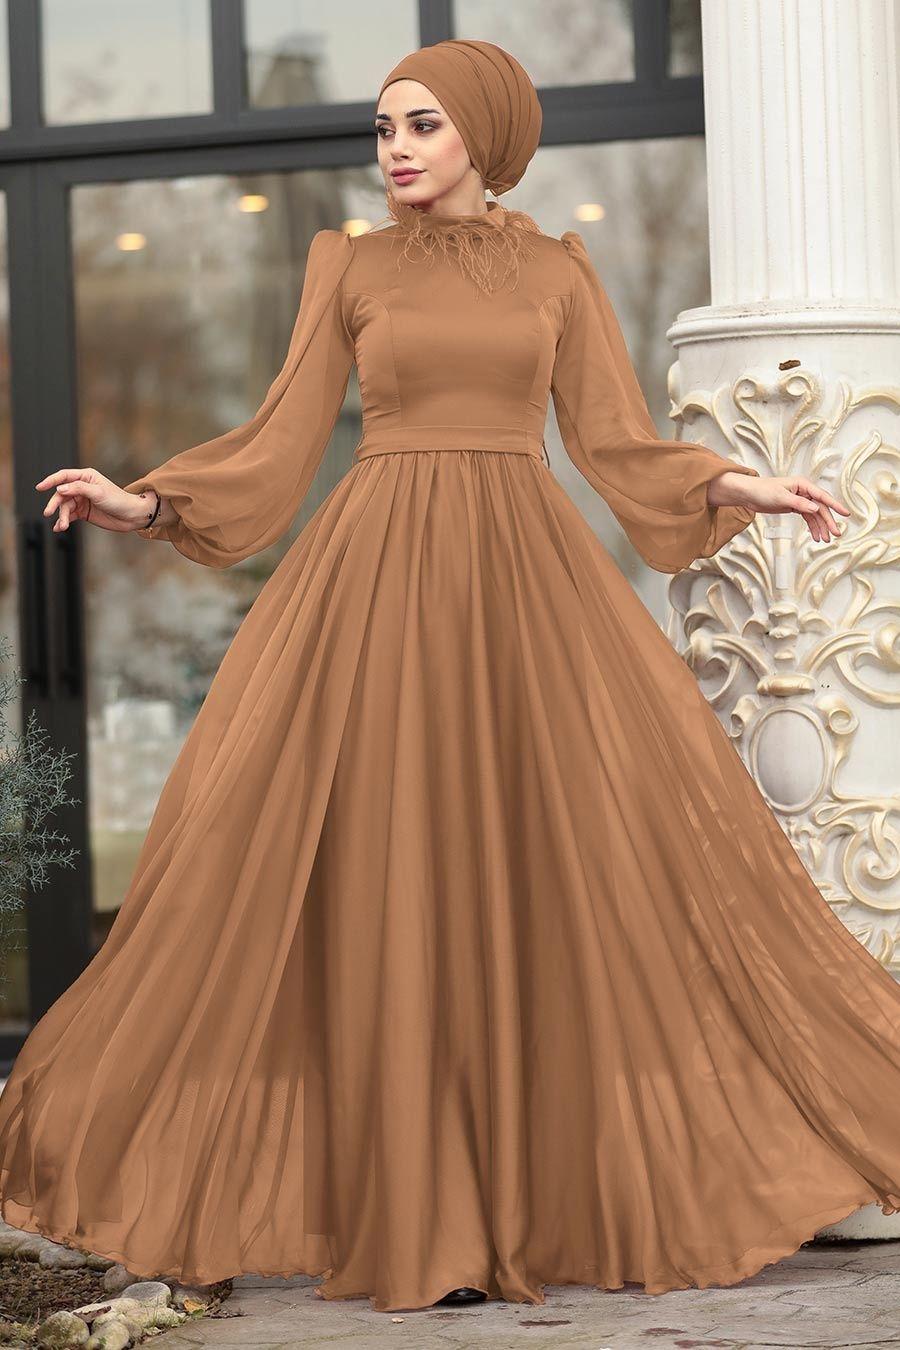 Tesetturlu Abiye Elbise Tuylu Balon Kol Taba Tesettur Abiye Elbise 3925tb Tesetturisland Com 2020 Islami Giyim Elbise Payet Elbise